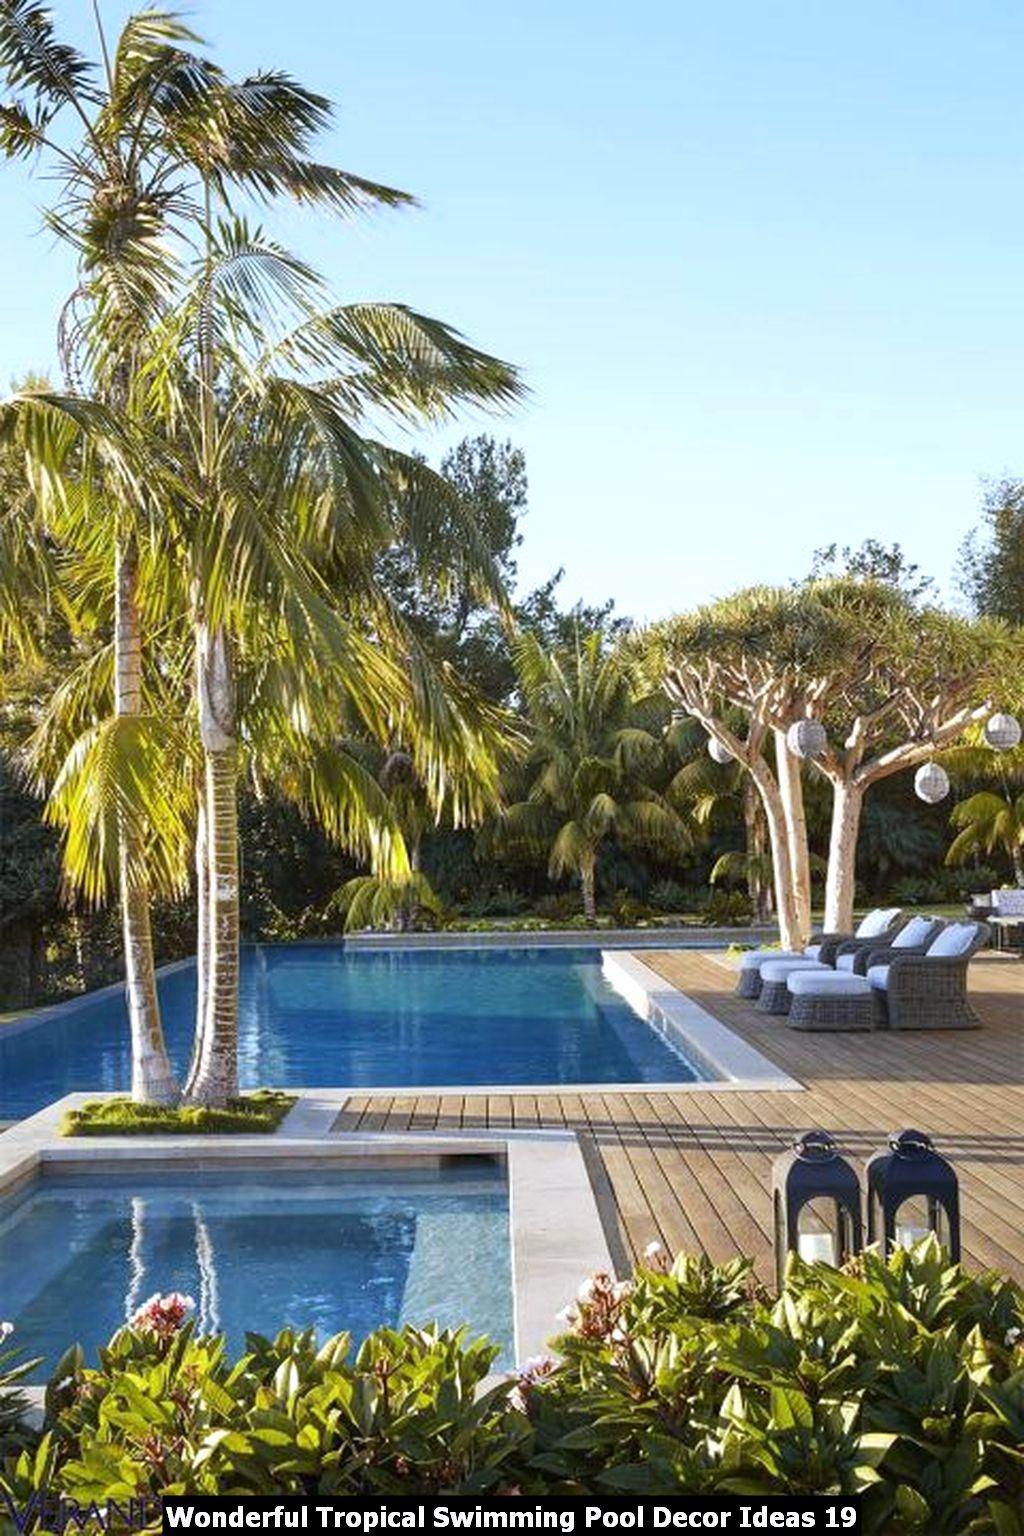 Wonderful Tropical Swimming Pool Decor Ideas 19